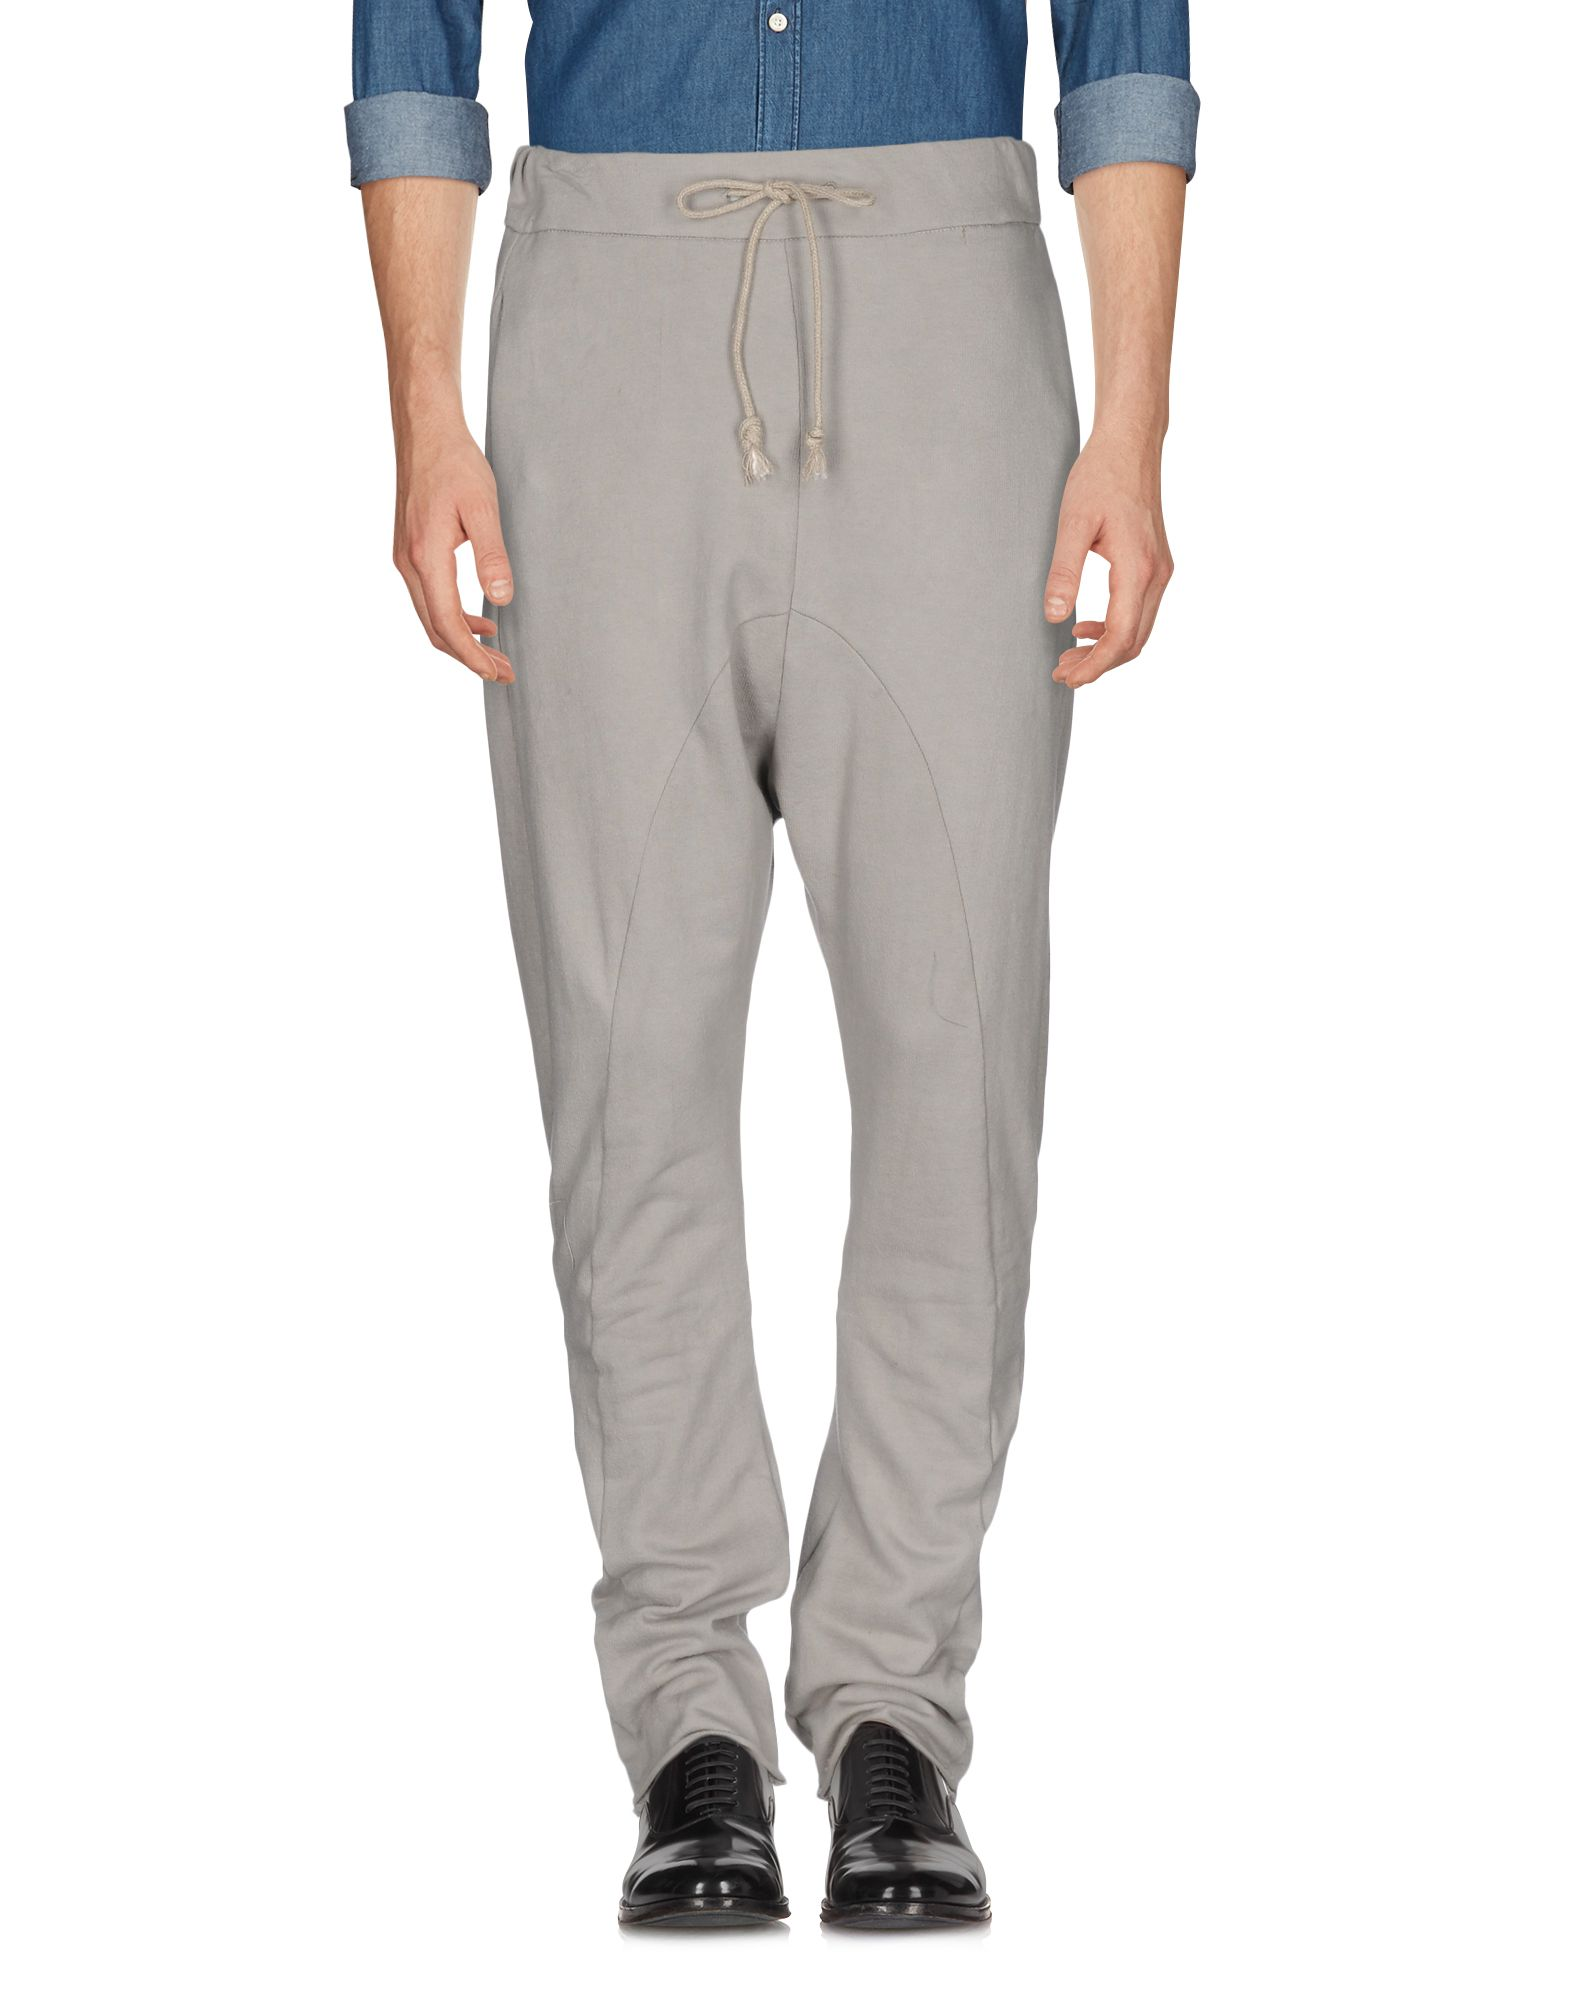 NICOLO' CESCHI BERRINI Повседневные брюки nicolo ceschi berrini рубашка с длинными рукавами